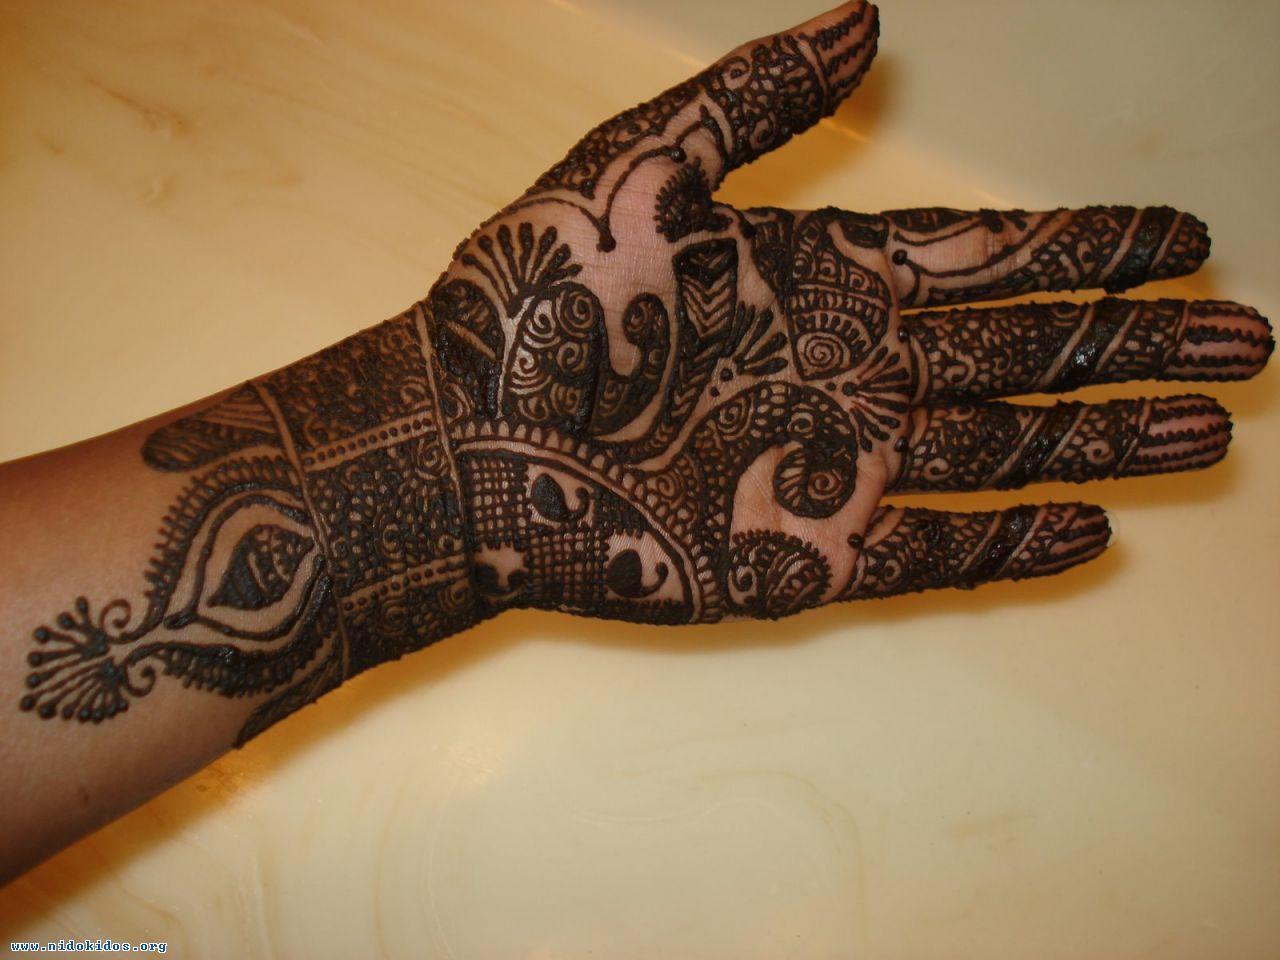 Mehndi Ke Tattoo : Tattoo mehandi designs for hand simple star